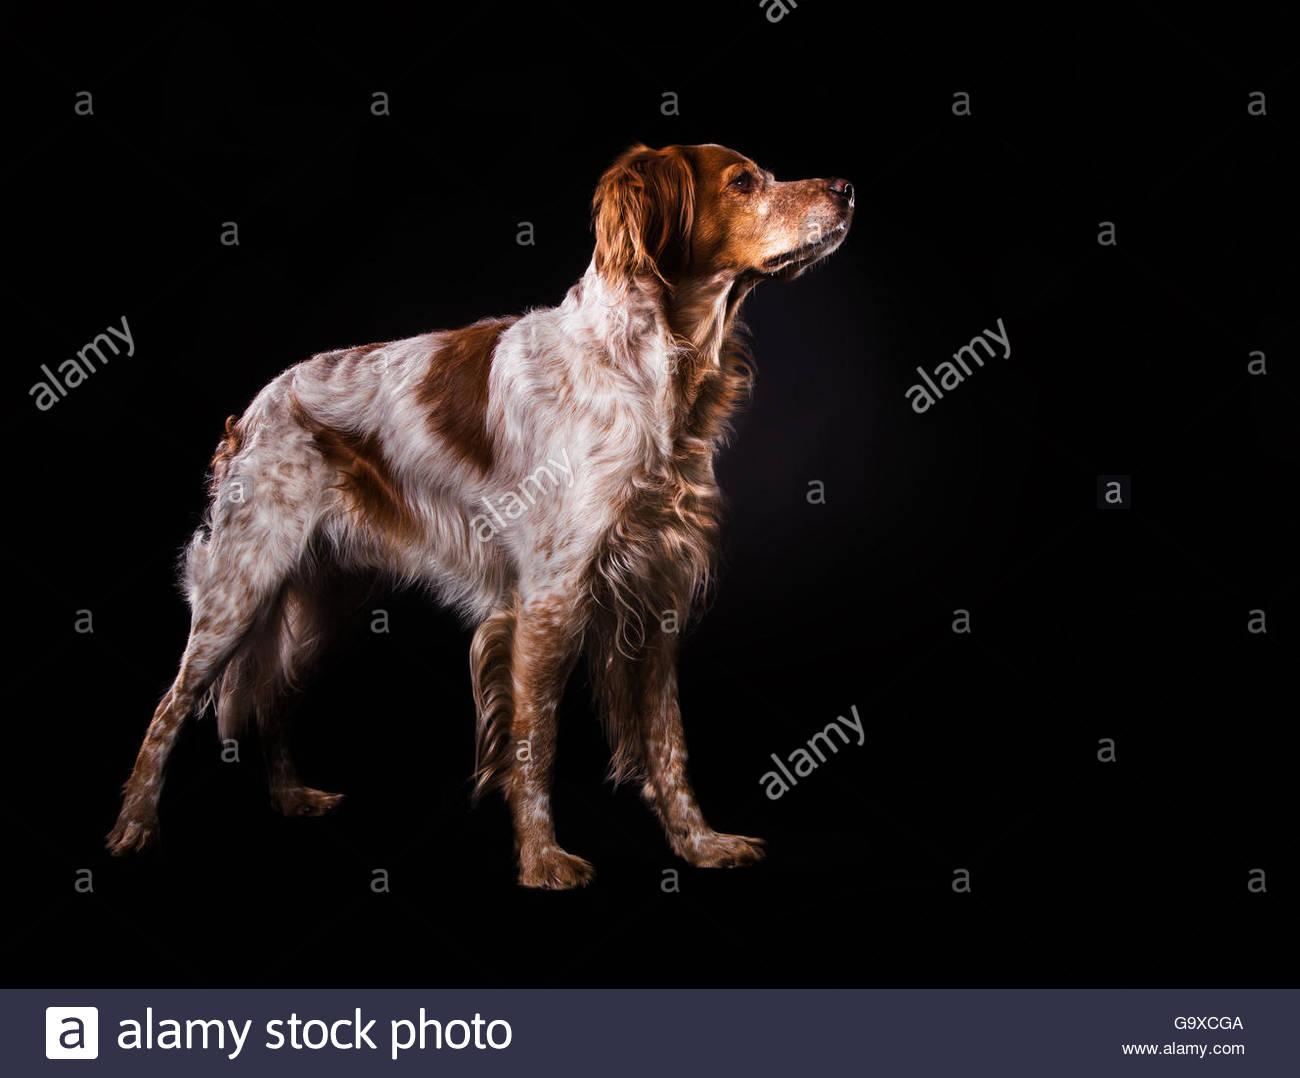 Studioshot from Epagneul Breton dog standing sideprofile - Stock Image